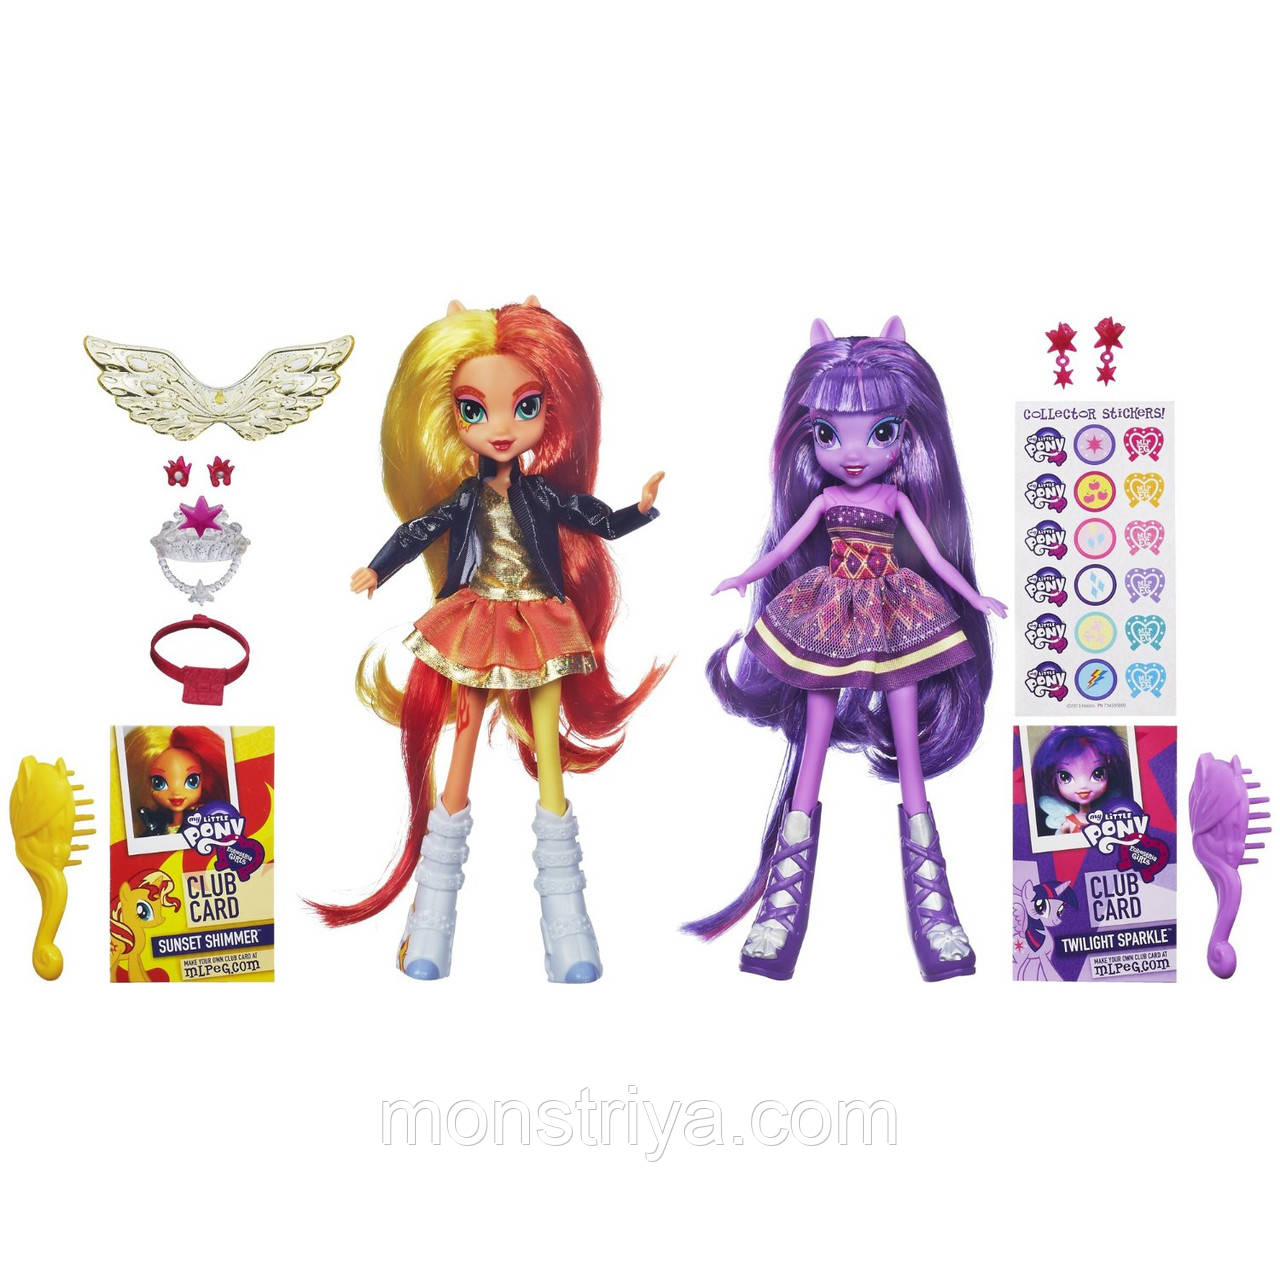 My Little Pony Equestria Girls набор из 2 кукол Искорка и ОгоньTwilight Sparkle and Sunset Shimmer купить пони